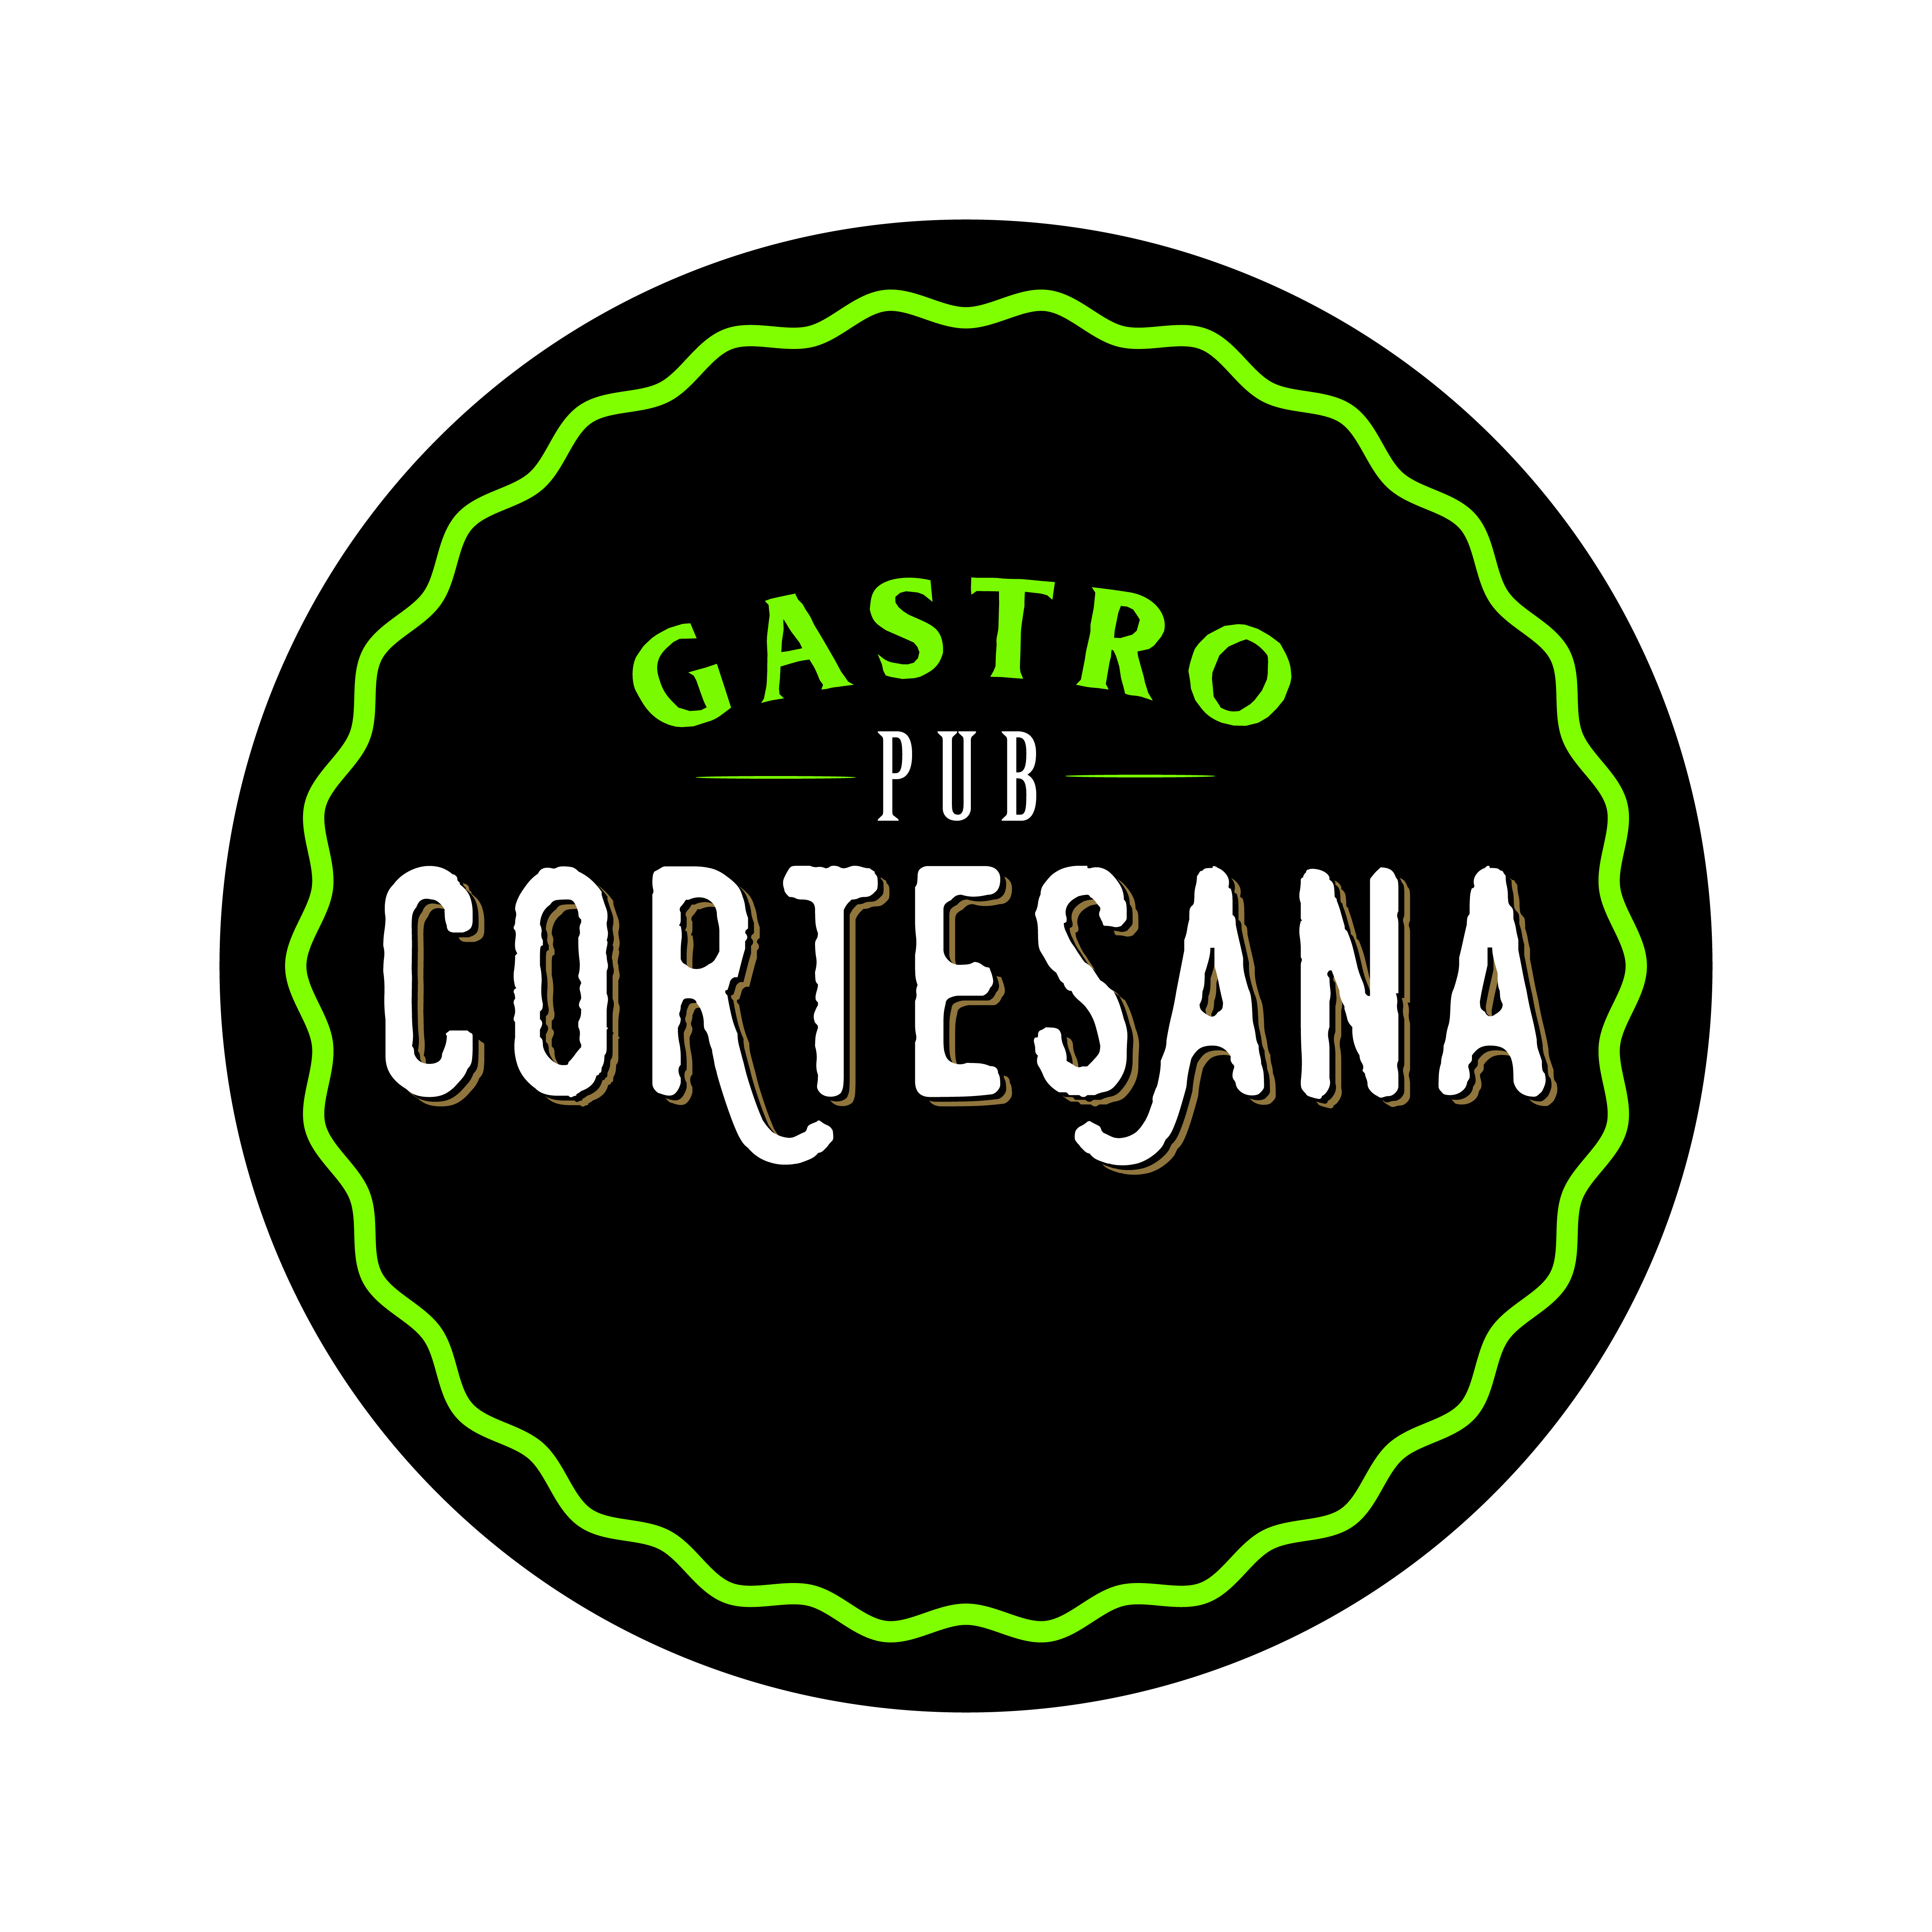 Gastro Pub by Cortesana